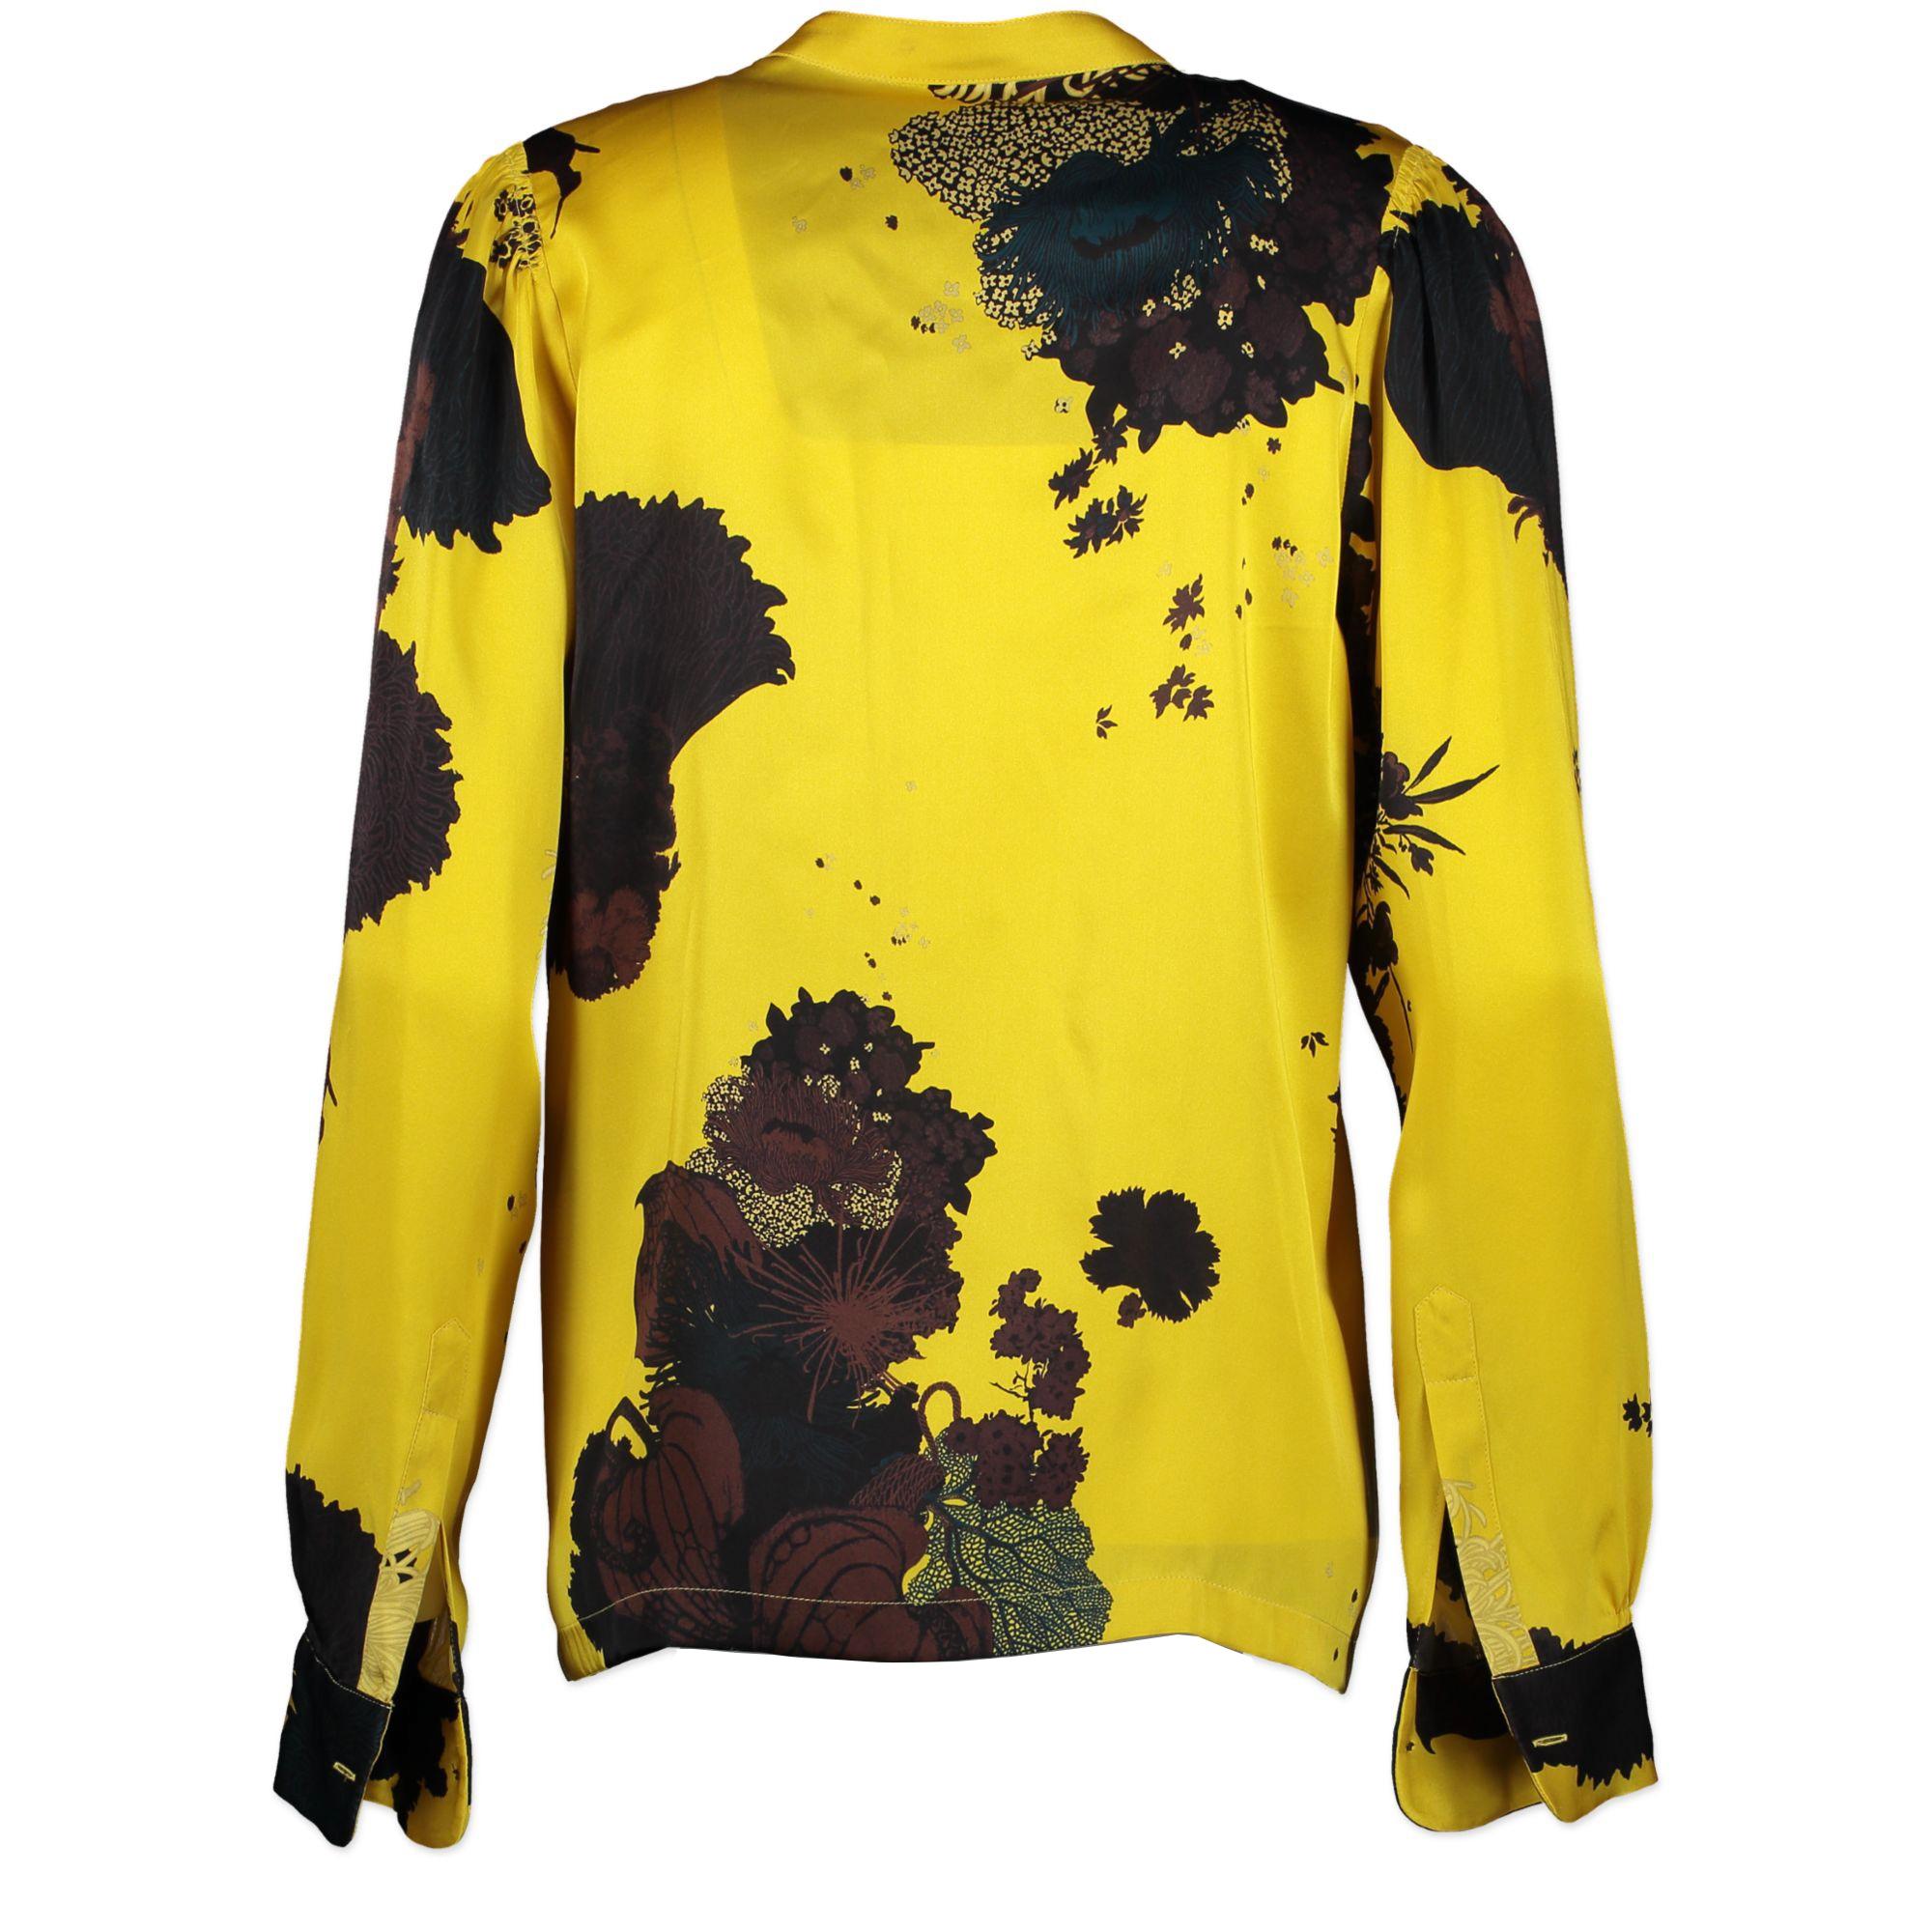 Dries Van Noten Yellow Silk Blouse - Size 36